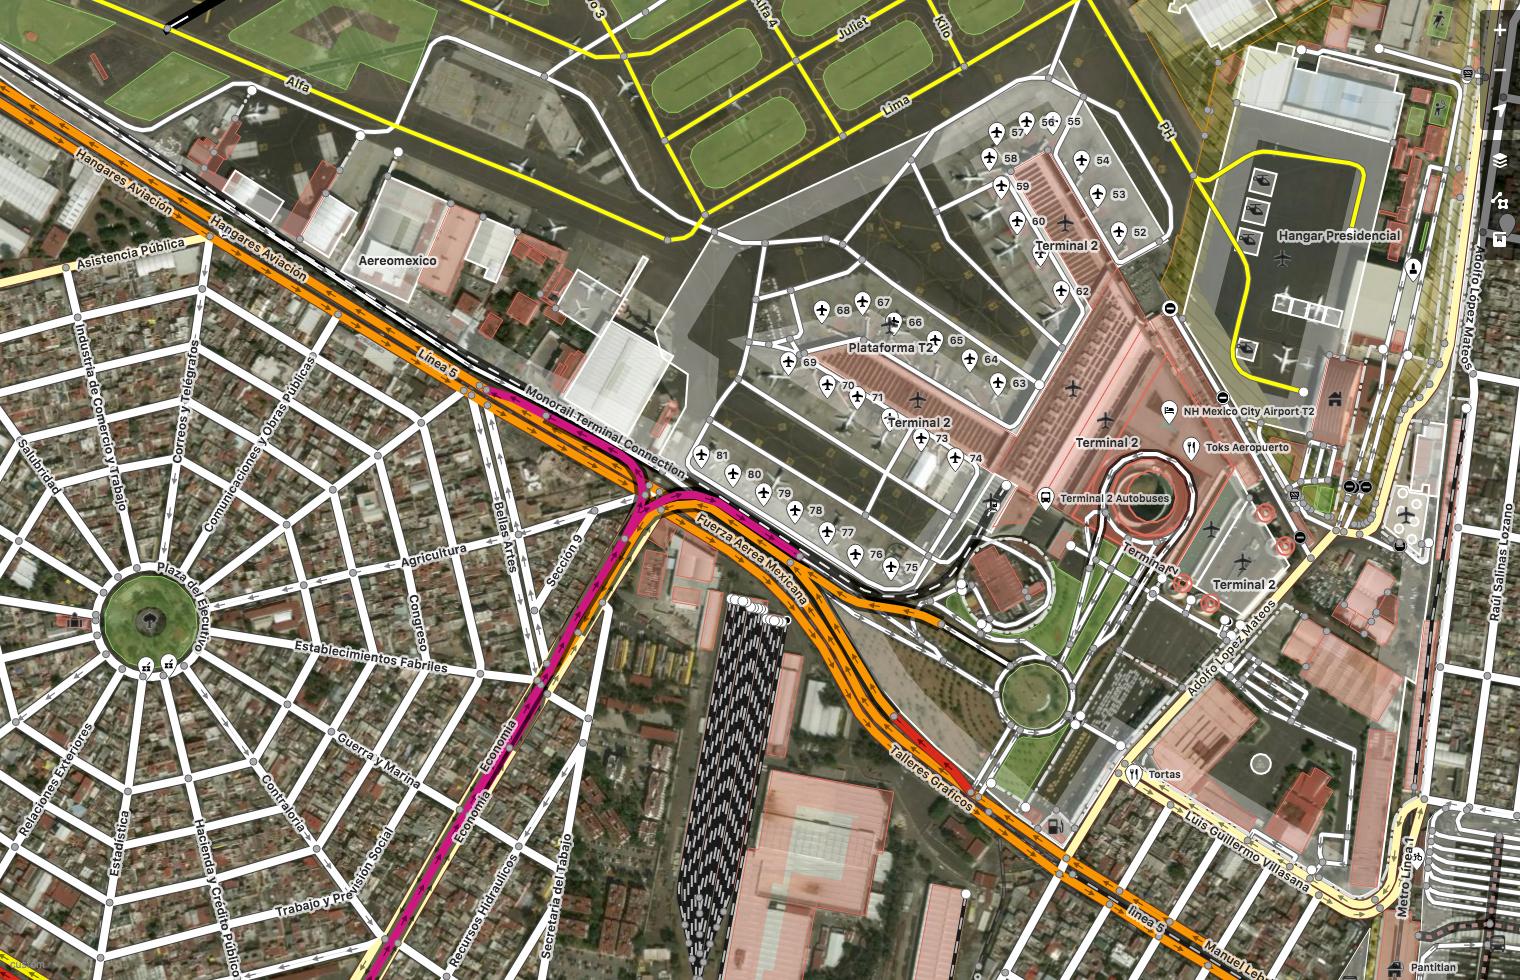 Mexico City, Mexico. Imagery (c) DigitalGlobe. Map (c) OpenStreetMap contributors